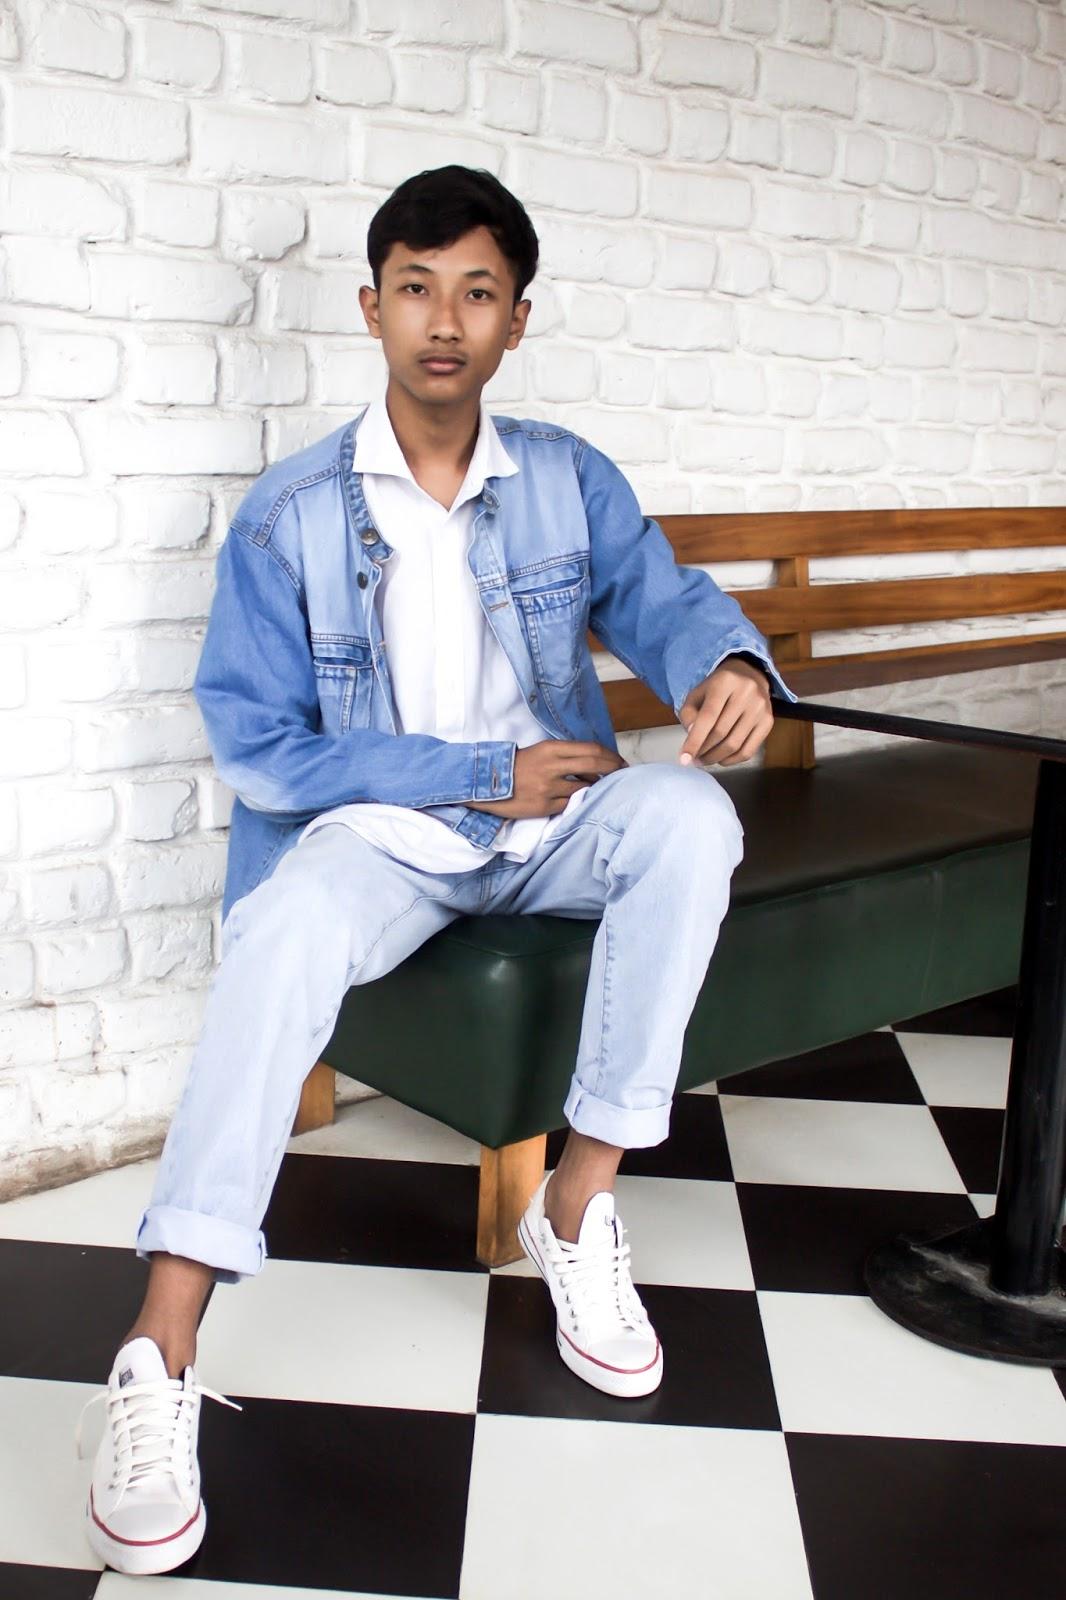 TheQuirkyMinimal by Kangkan Rabha Indian Menswear fashion blog review on 11th Avenue Cafe Bistro uzan bazaa Guwahati